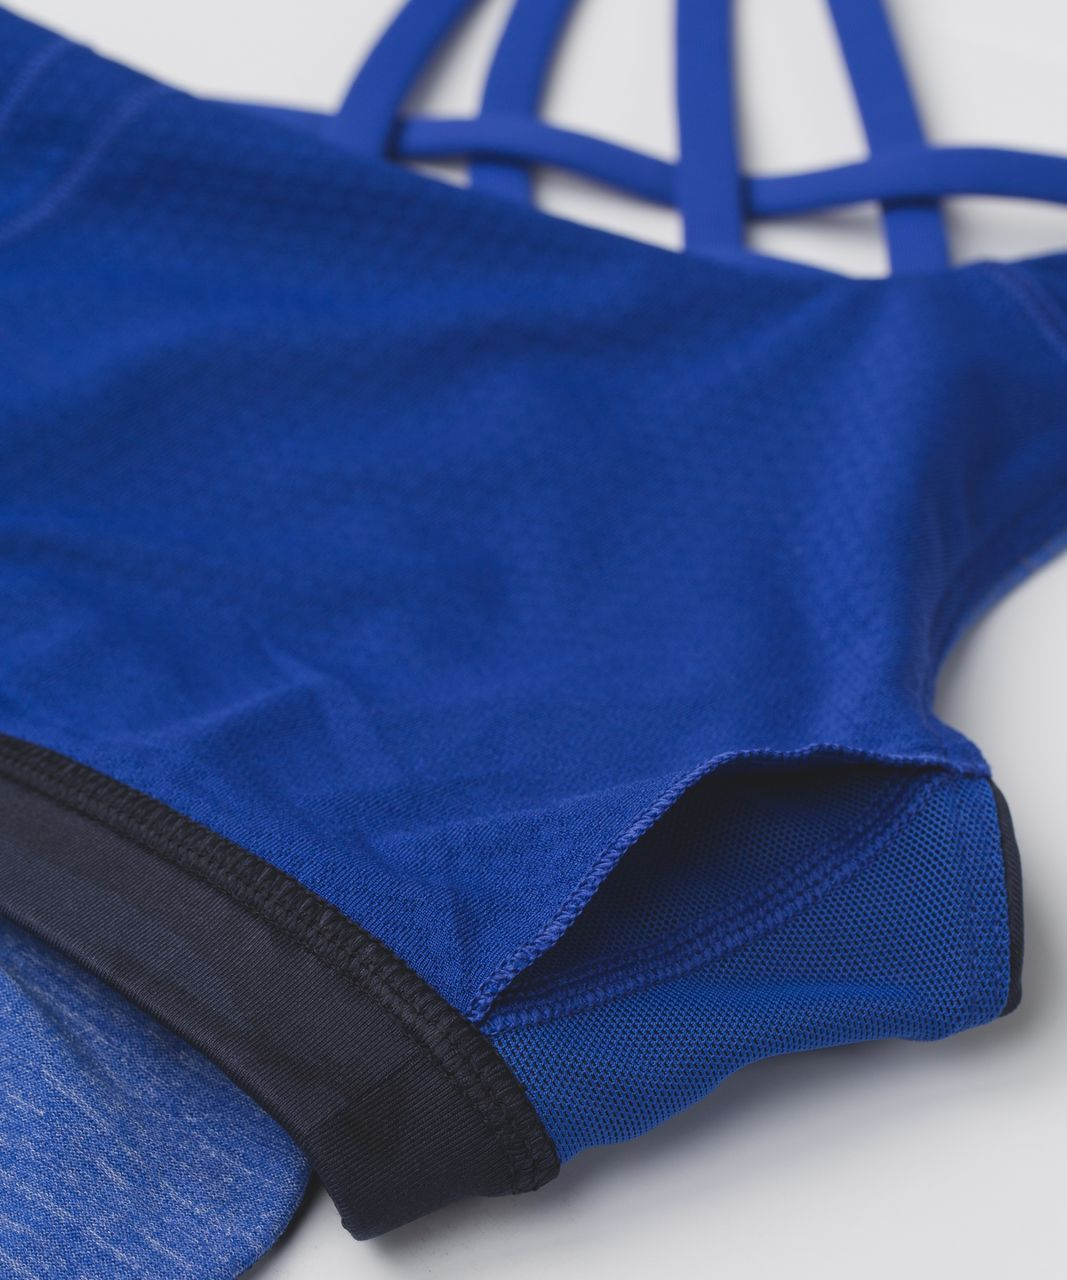 Lululemon Wild Tank - Heathered Sapphire Blue / Mini Coast Camo Deep Navy Black / Sapphire Blue